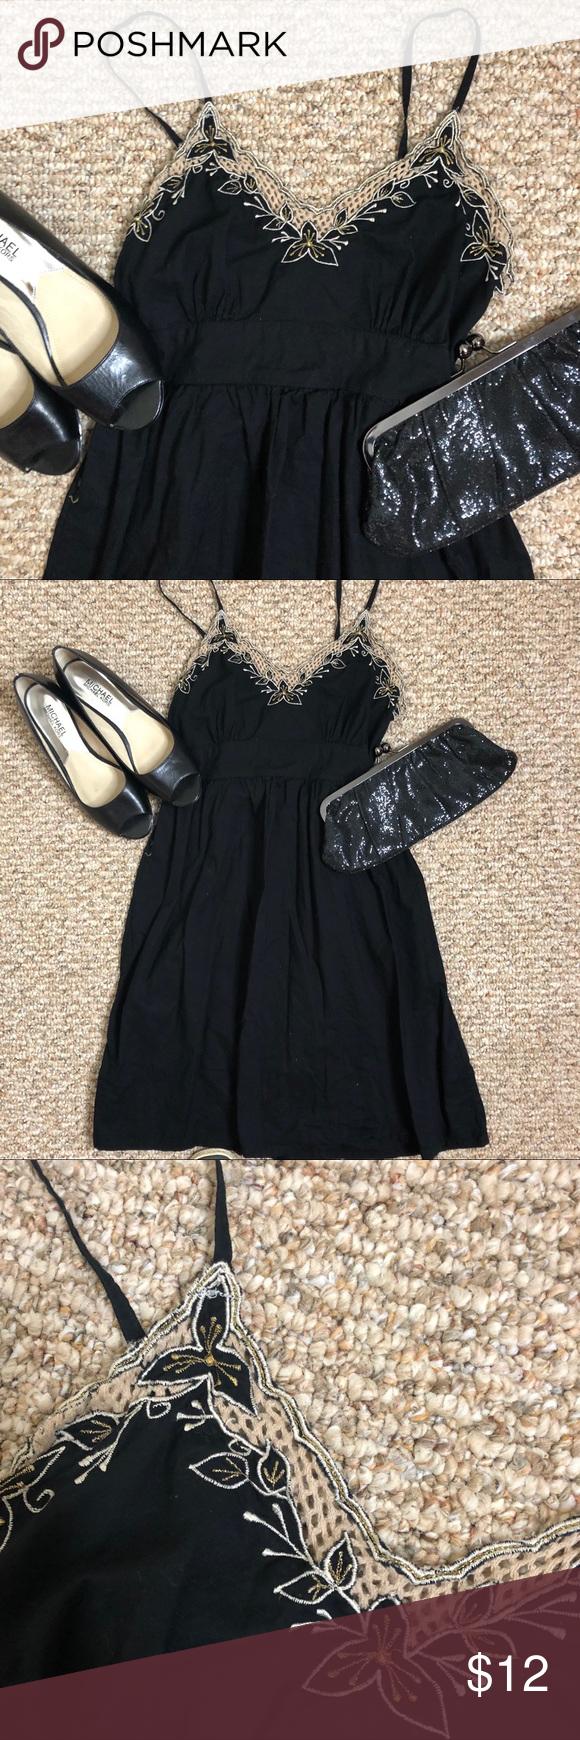 Forever 21 Black Dress Gold Neckline Size M Forever Twentyone Black Dress With Gold Trim On Top The Dress Ties In The Bac Black Dress Clothes Design Dresses